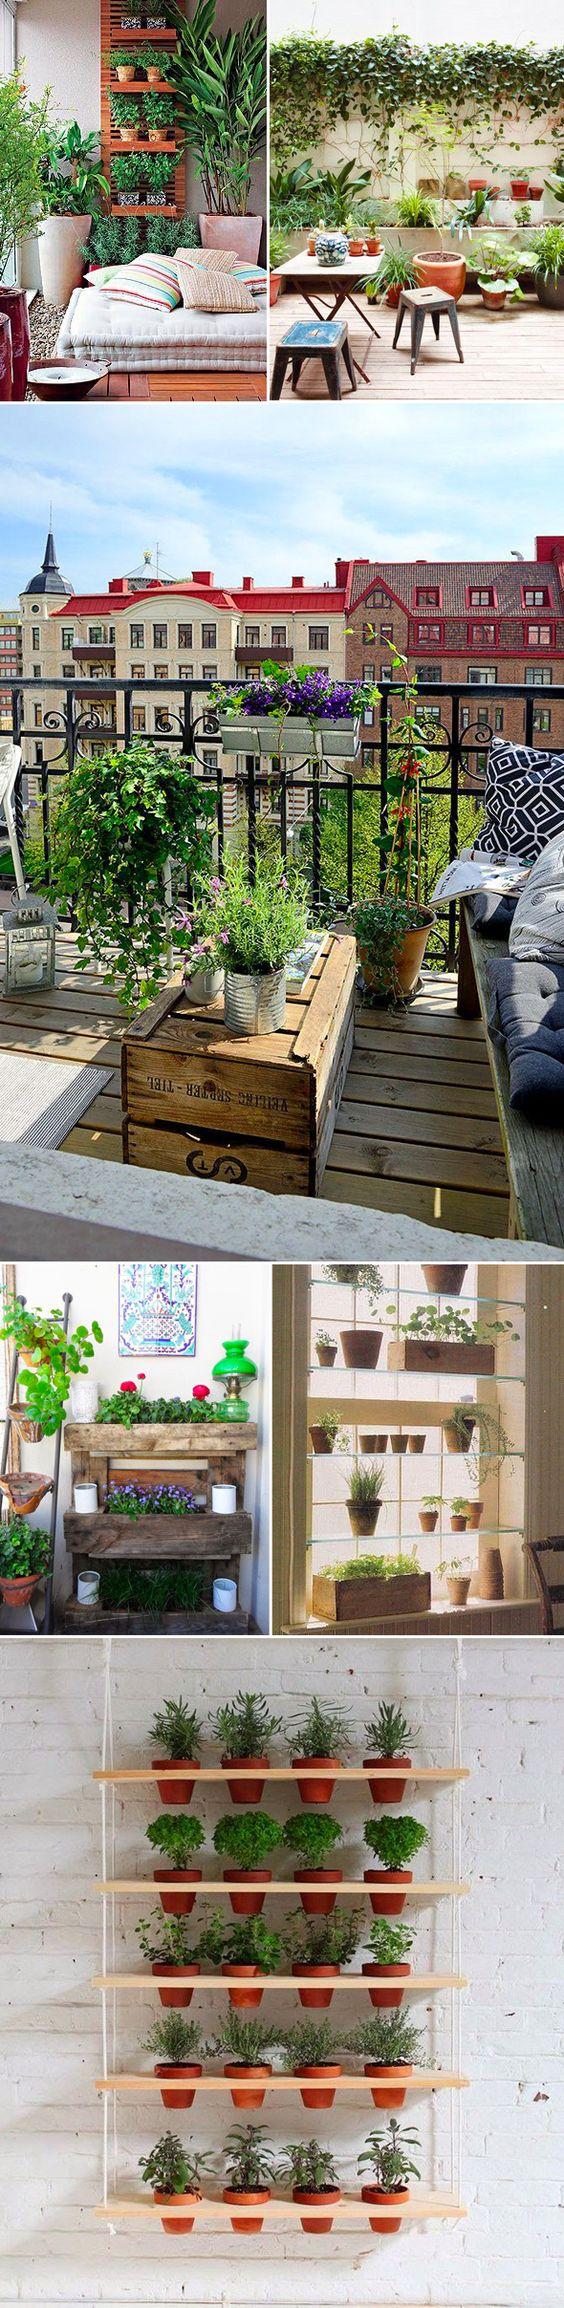 jardins_005